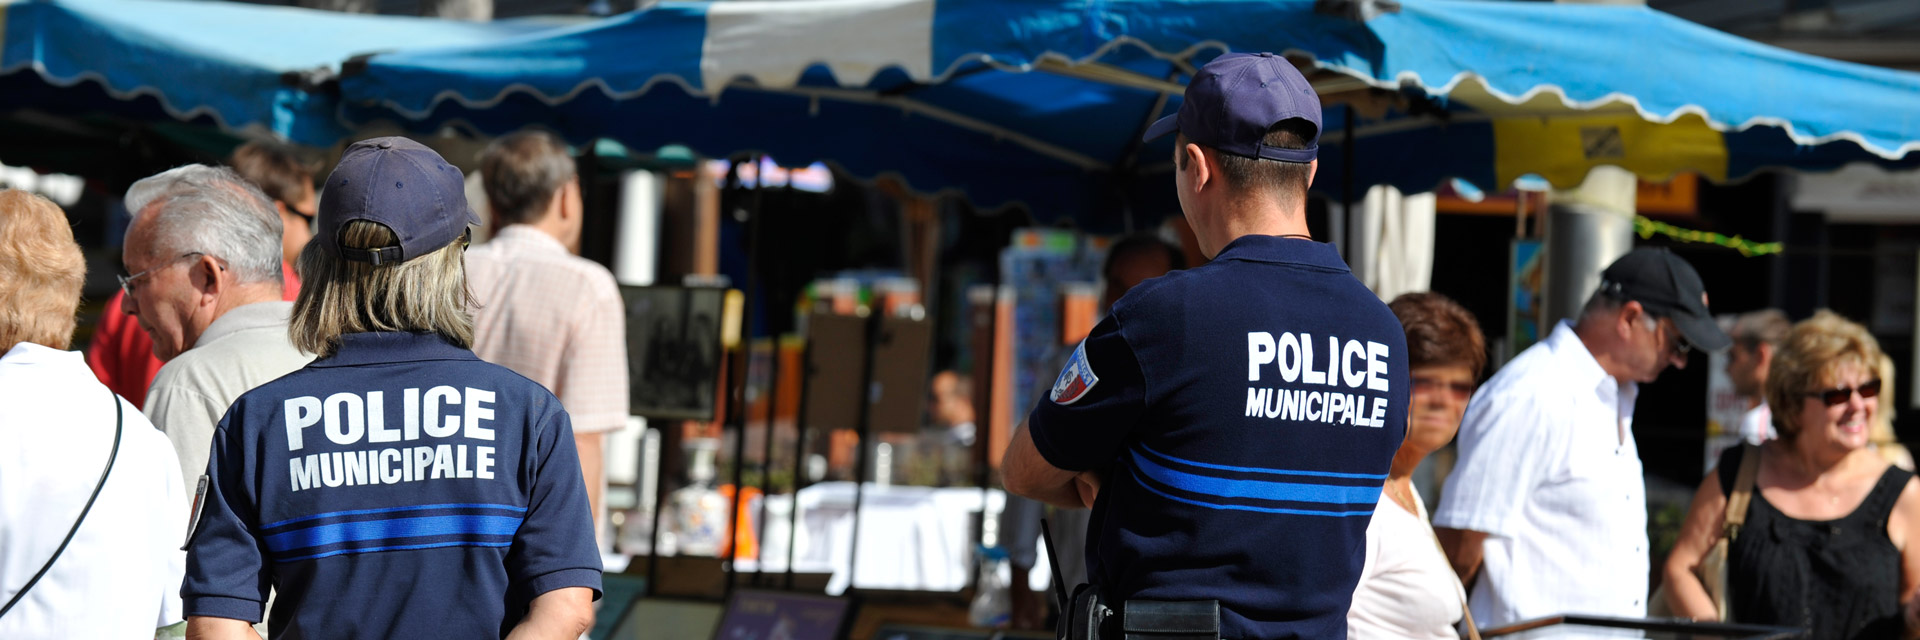 Police Municipale au Marché